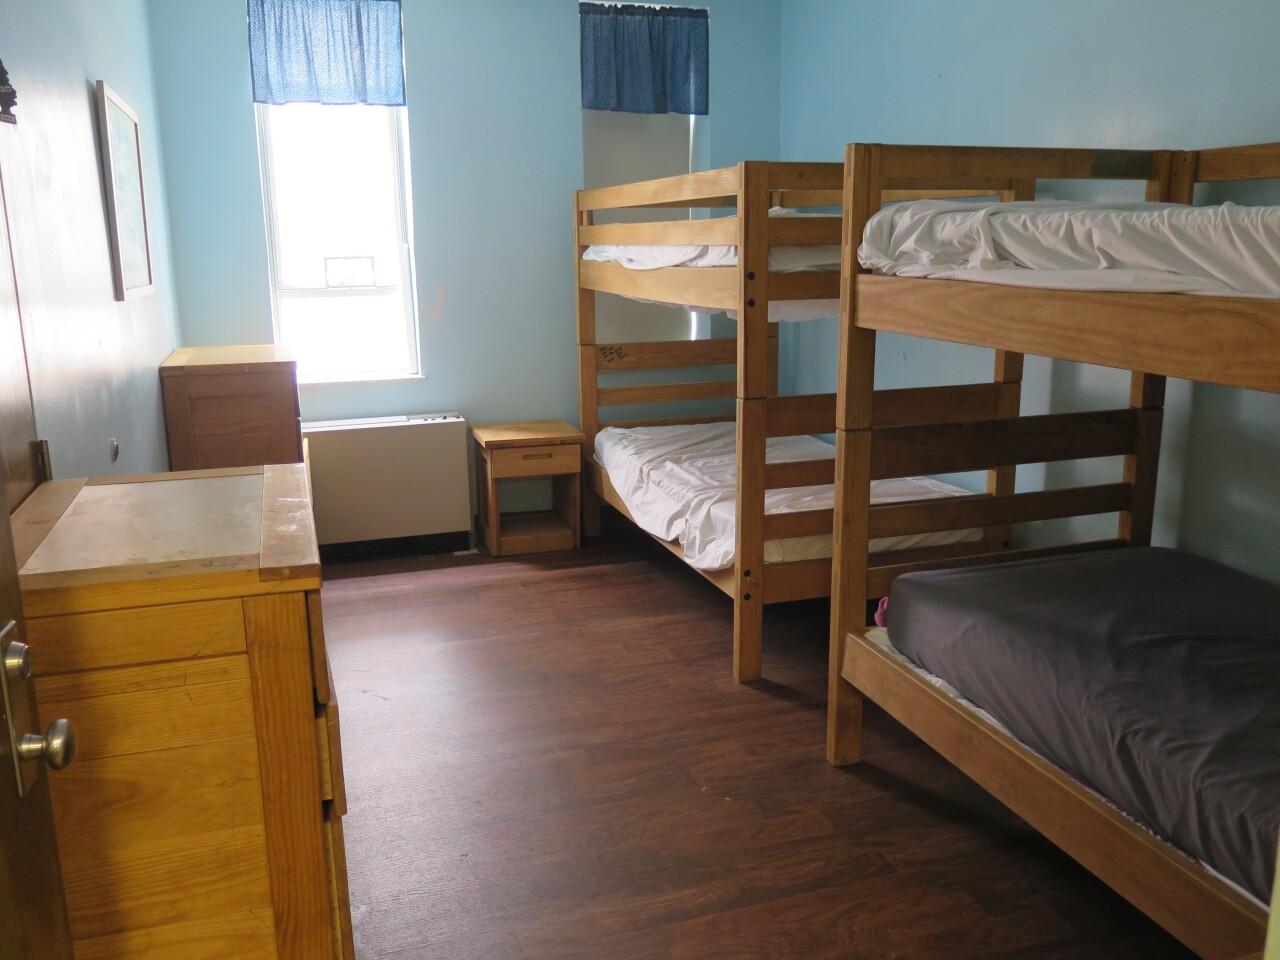 Salvation_Army_shelter_room.JPG